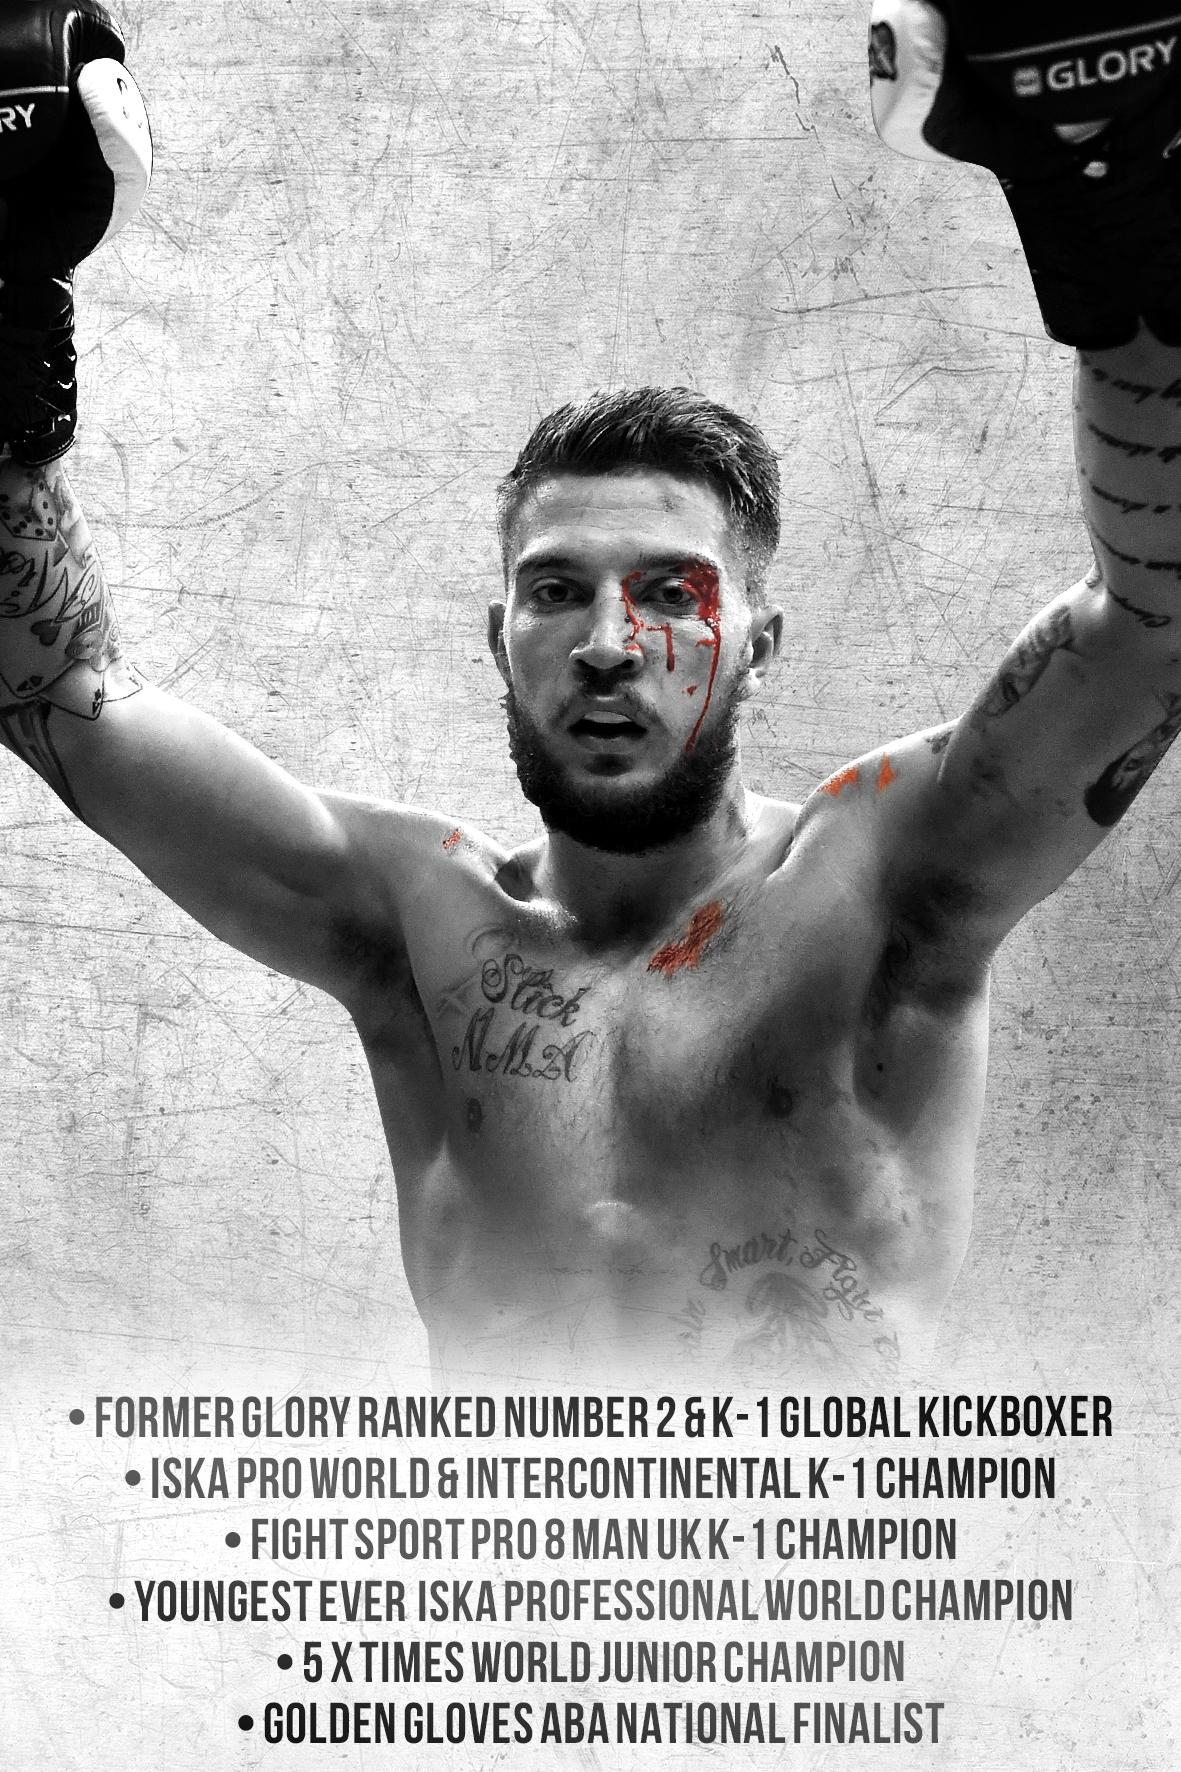 K-1 / Kickboxing Career – Chad '2 Slick' Sugden